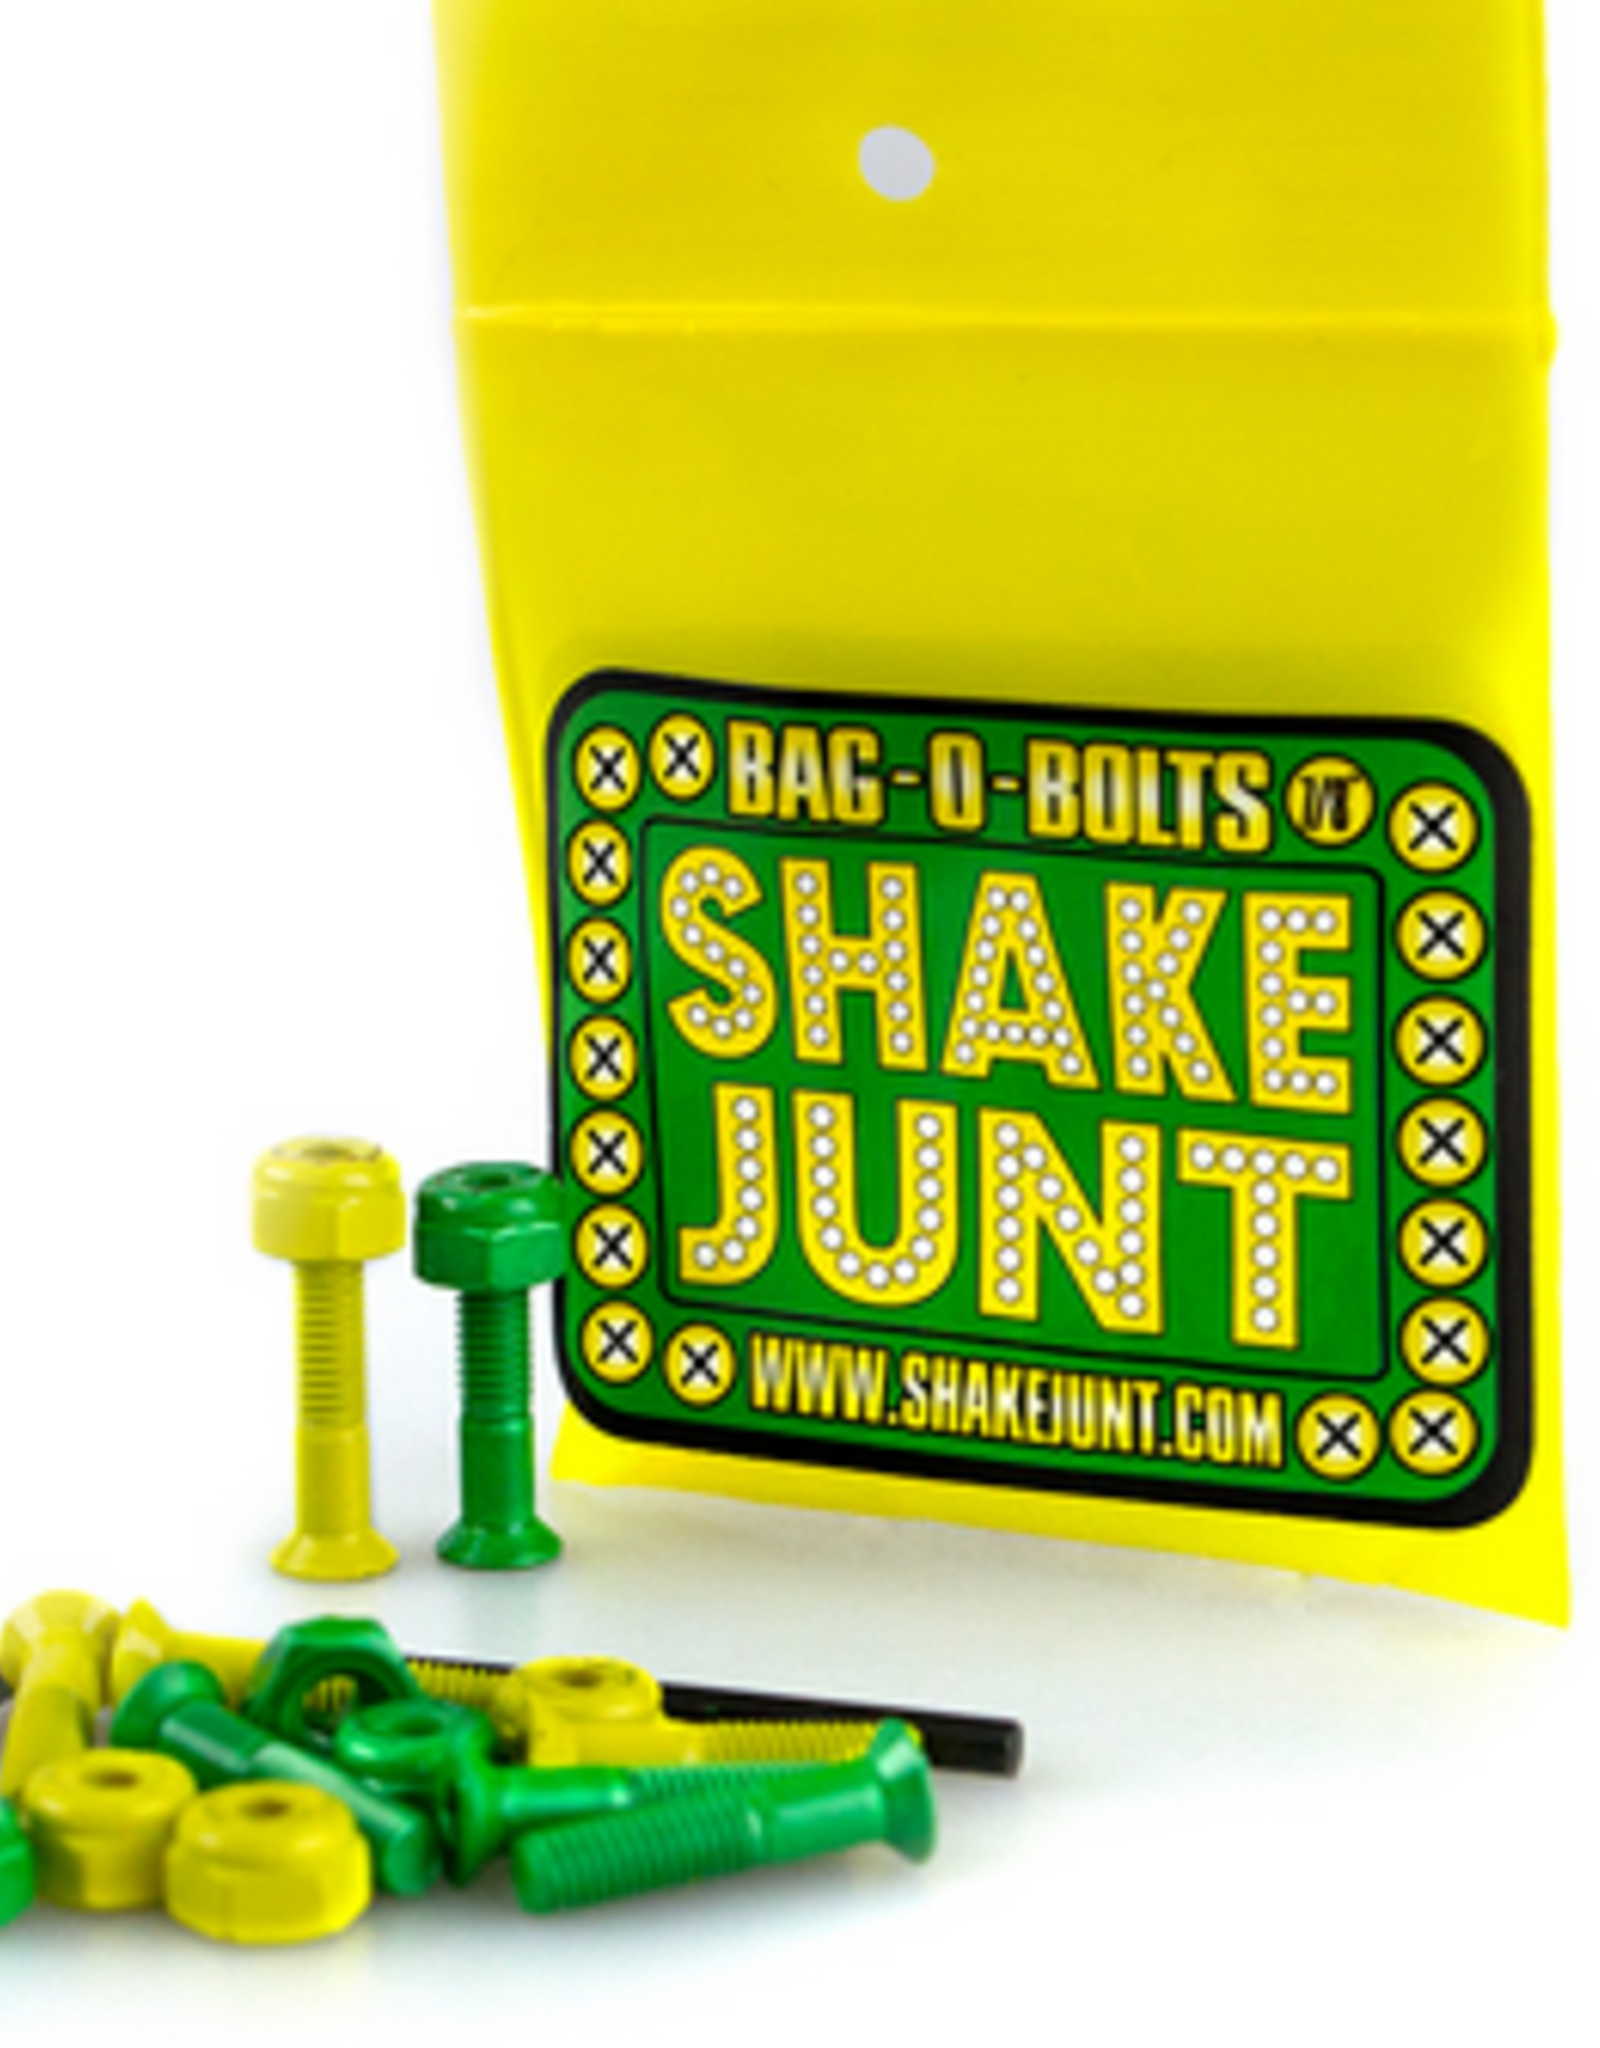 SHAKE JUNT SHAKE JUNT 7/8 PHILLIPS HARDWARE SET GRN YLW